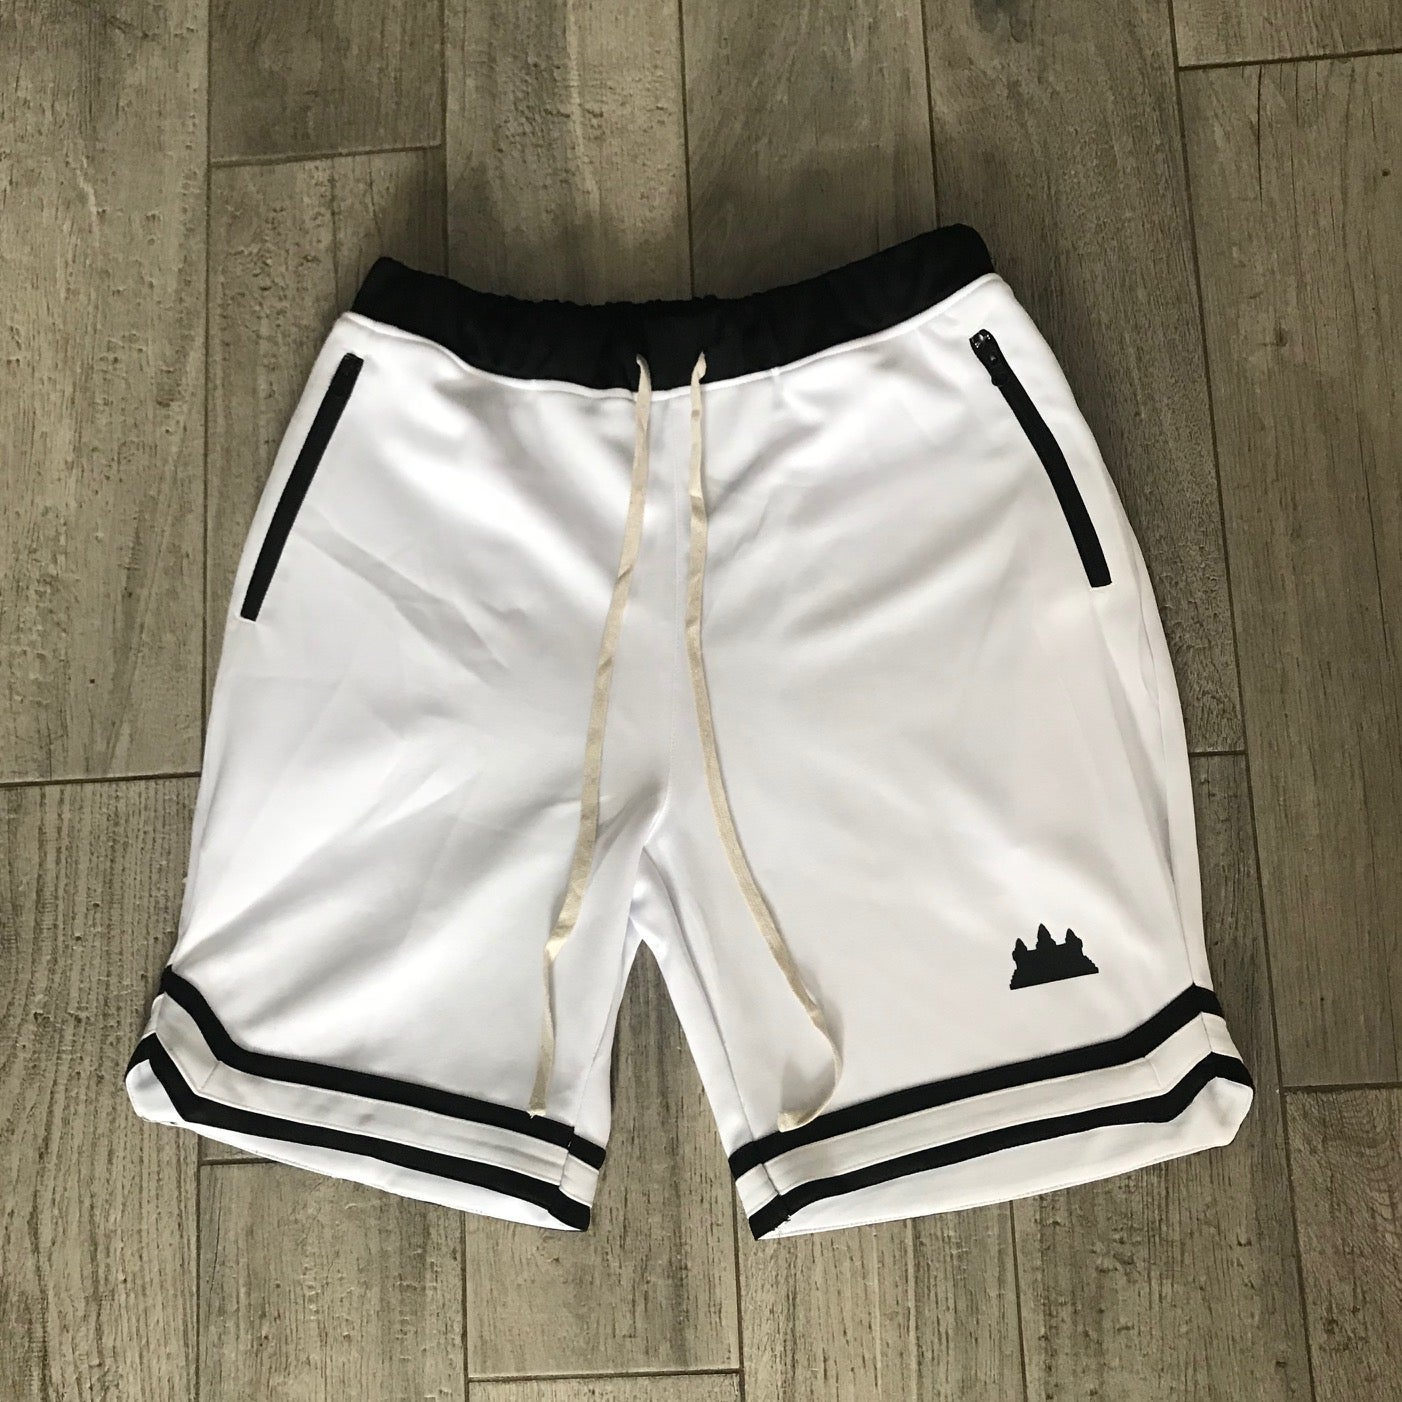 Premium Vintage Shorts Cambodia Basketball Rep 3L4Rj5A